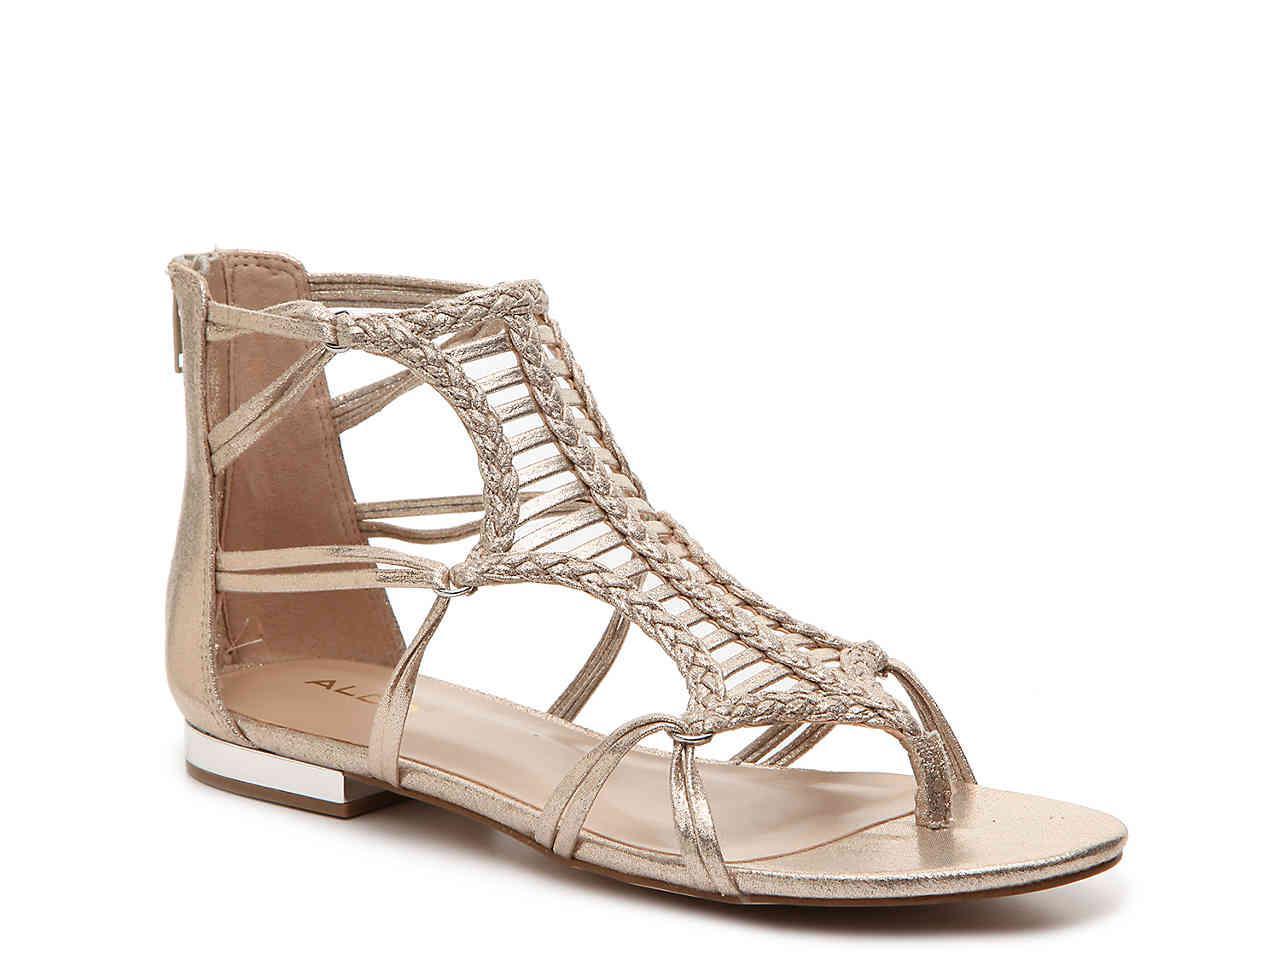 ec201b67292e Lyst - ALDO Demme Gladiator Sandal in Metallic